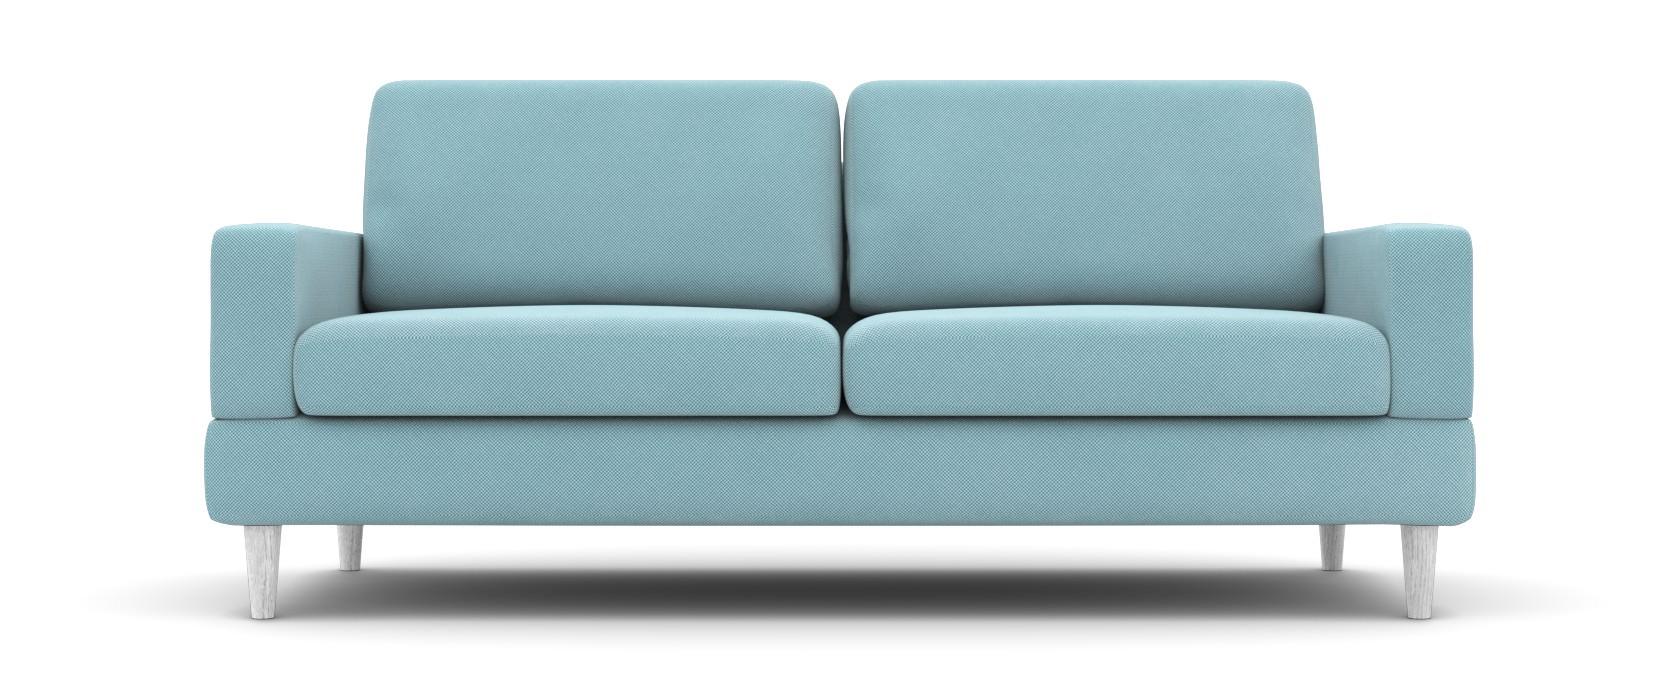 Трехместный диван Bruno - Фото 1 - Pufetto